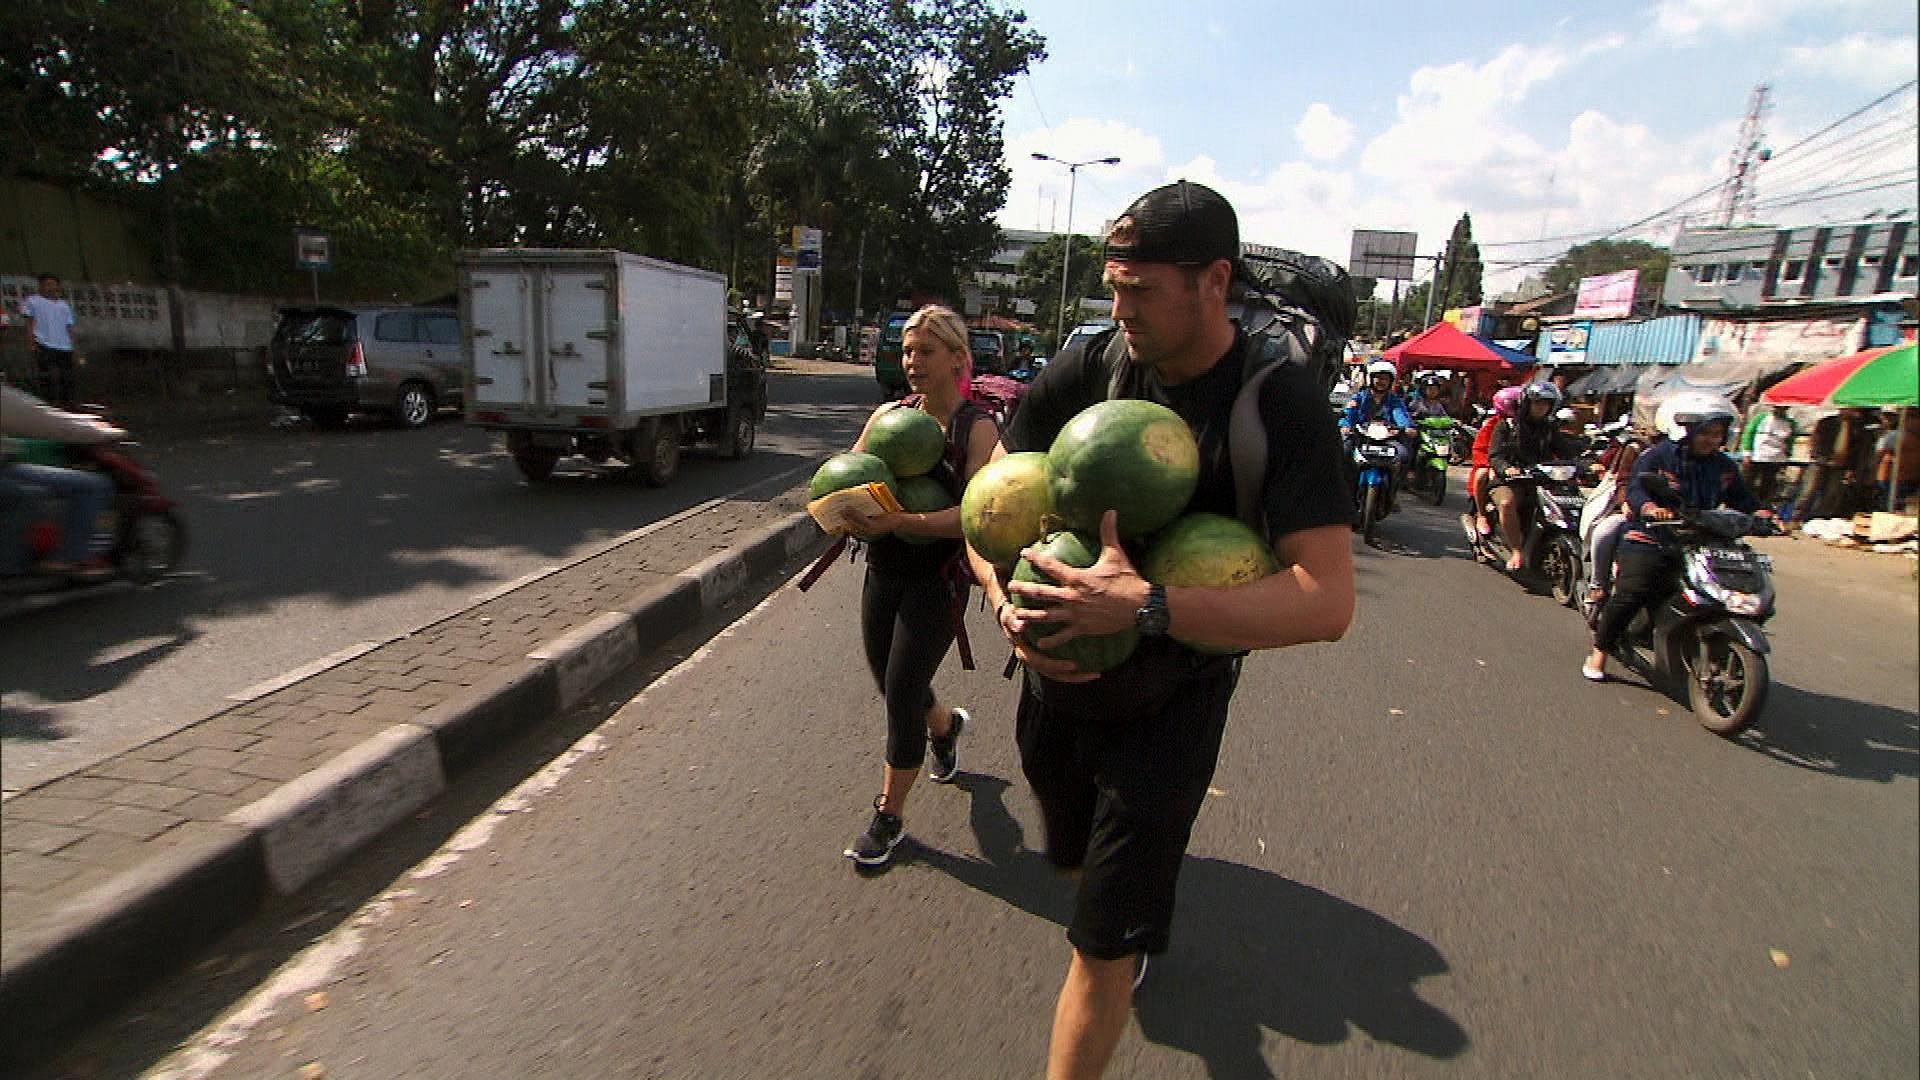 Carrying food in Season 23 Episode 9